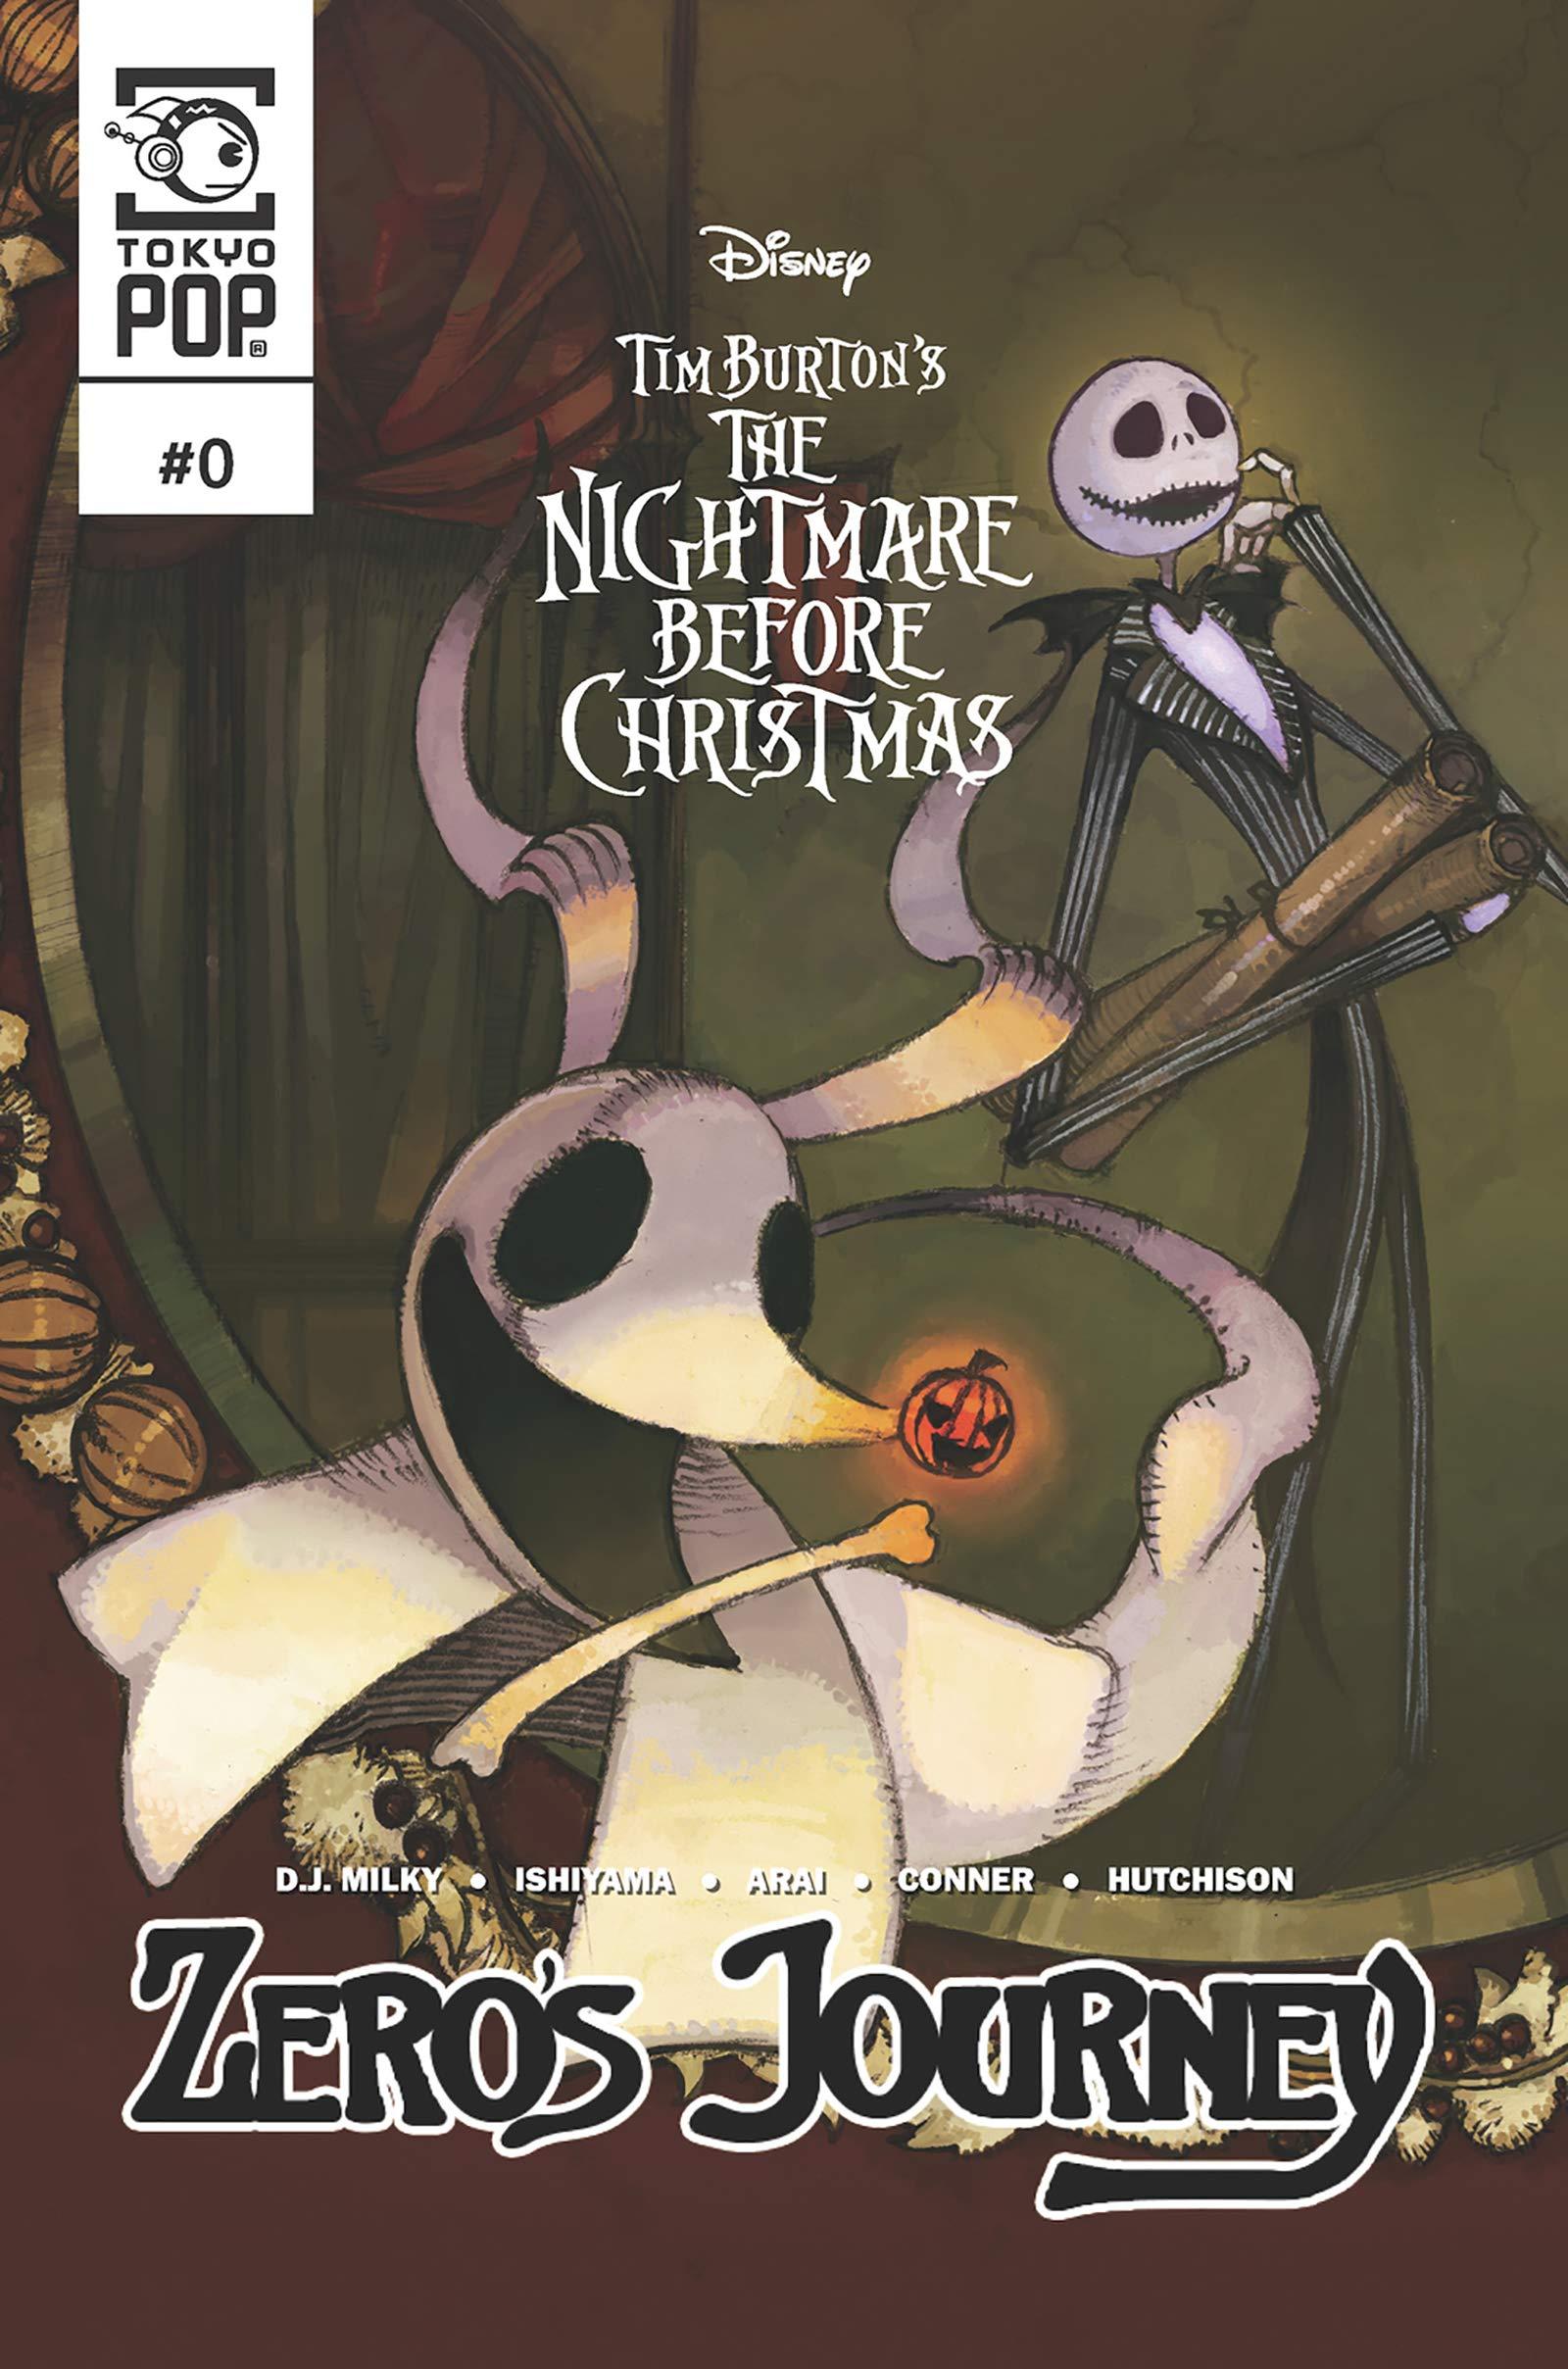 Disney Manga: The Nightmare Before Christmas — Zero's Journey Issue #0 (Prologue) (Zero's Journey Comic series)